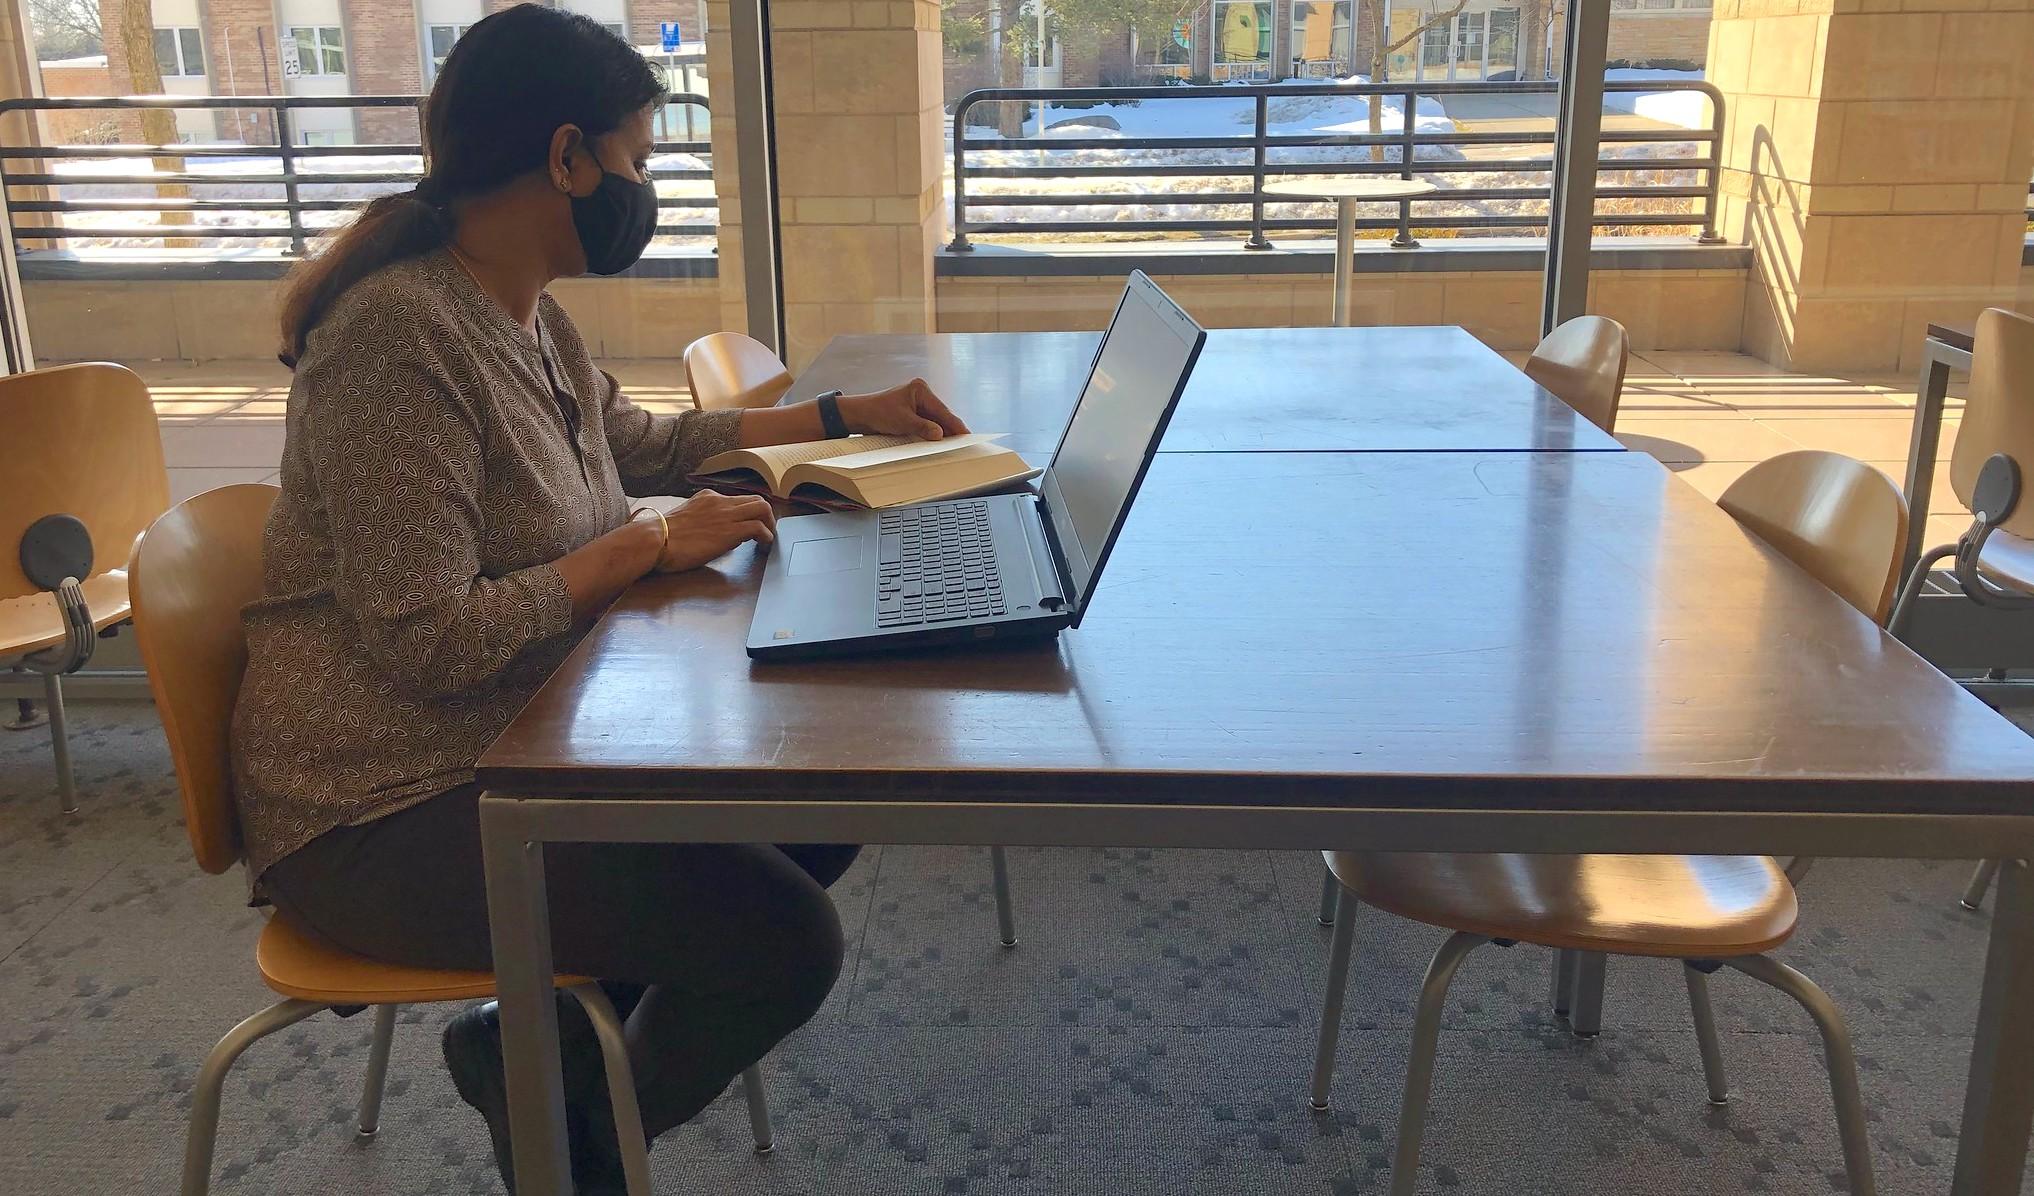 Genealogy research on laptop